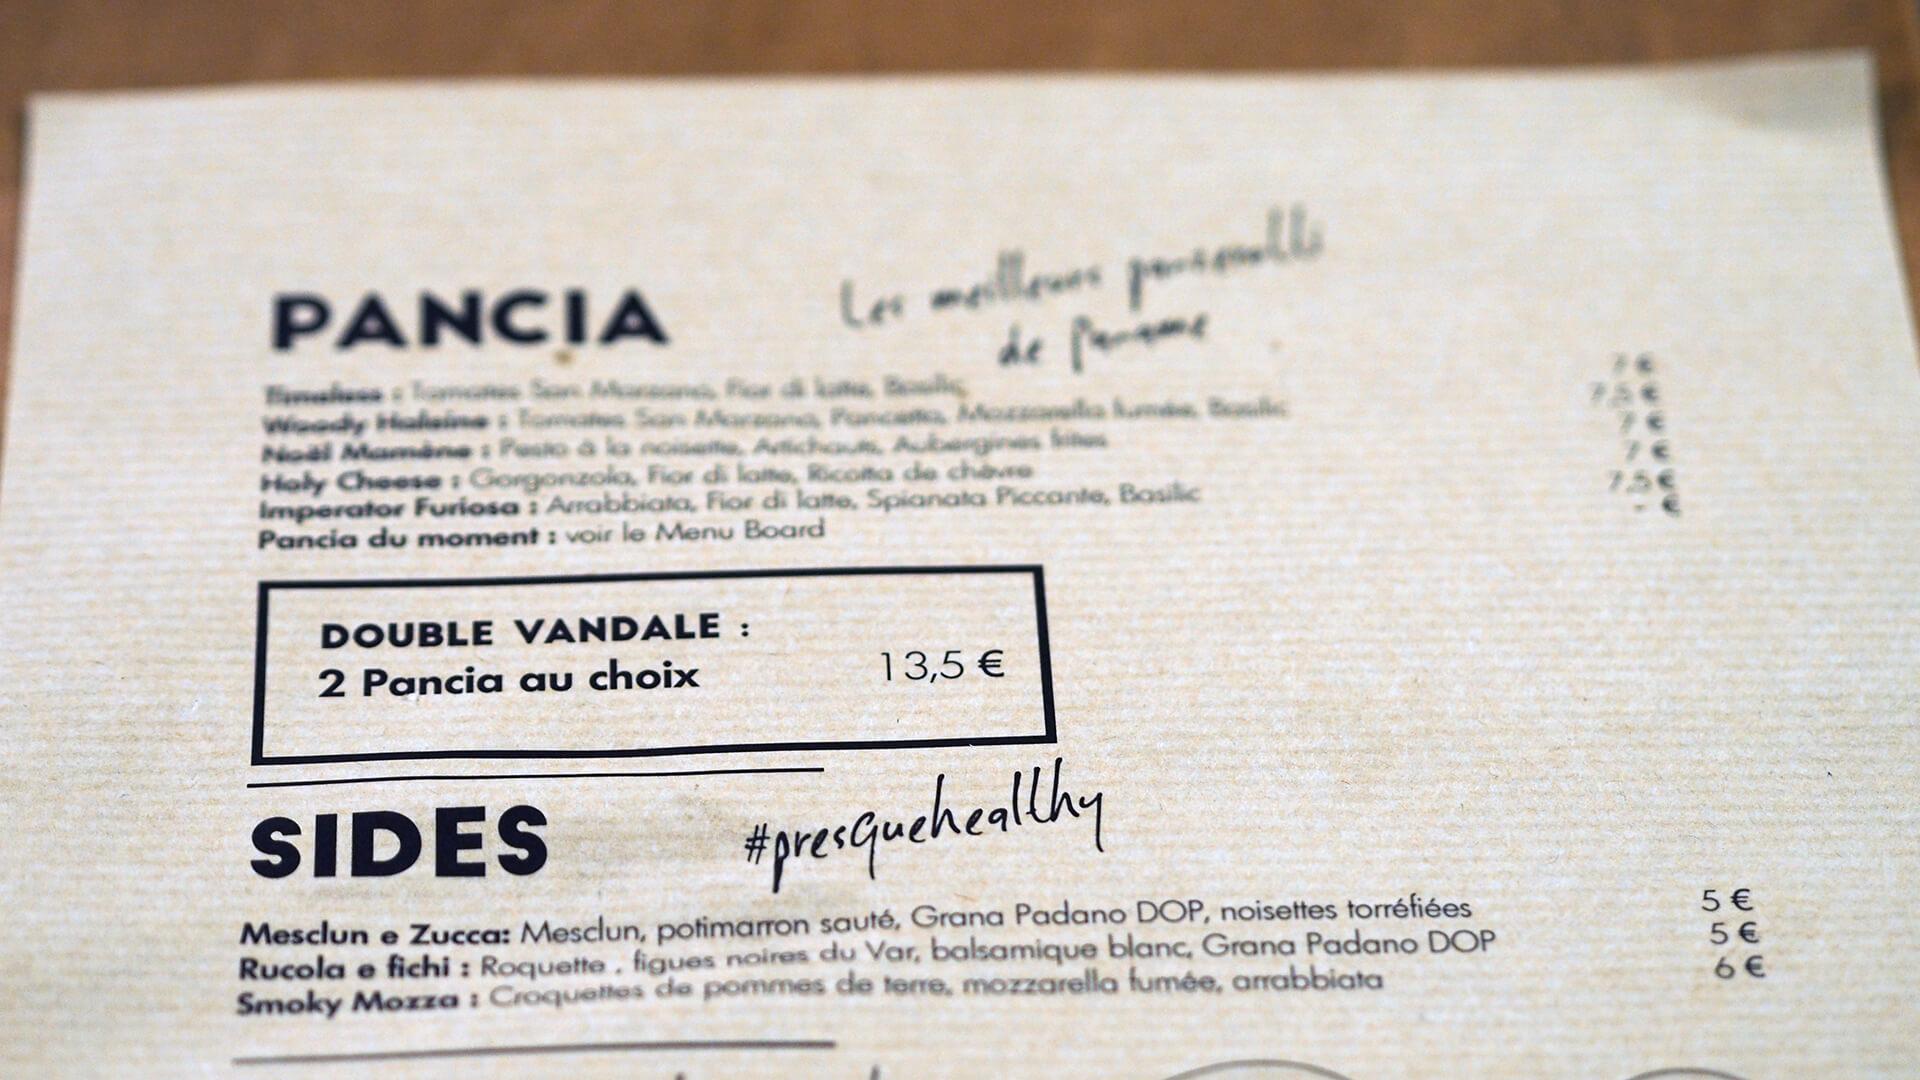 Restaurant Pancia Paris 75010